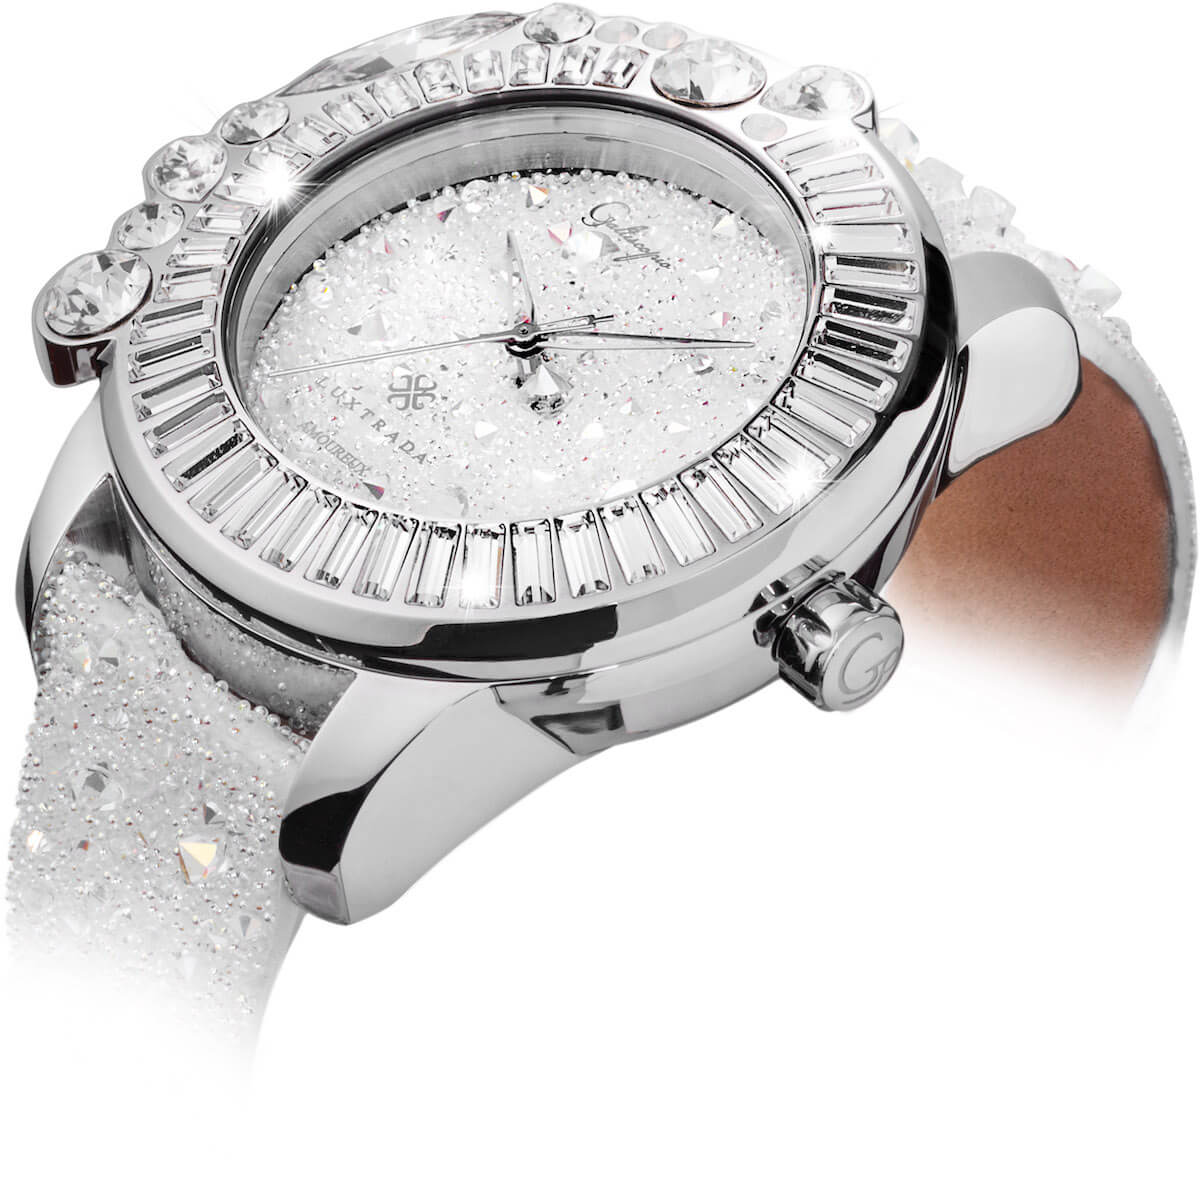 超閃!galtiscopio迦堤浪漫派水晶腕錶 超閃!GALTISCOPIO迦堤浪漫派水晶腕錶 AUSS001SWLS S